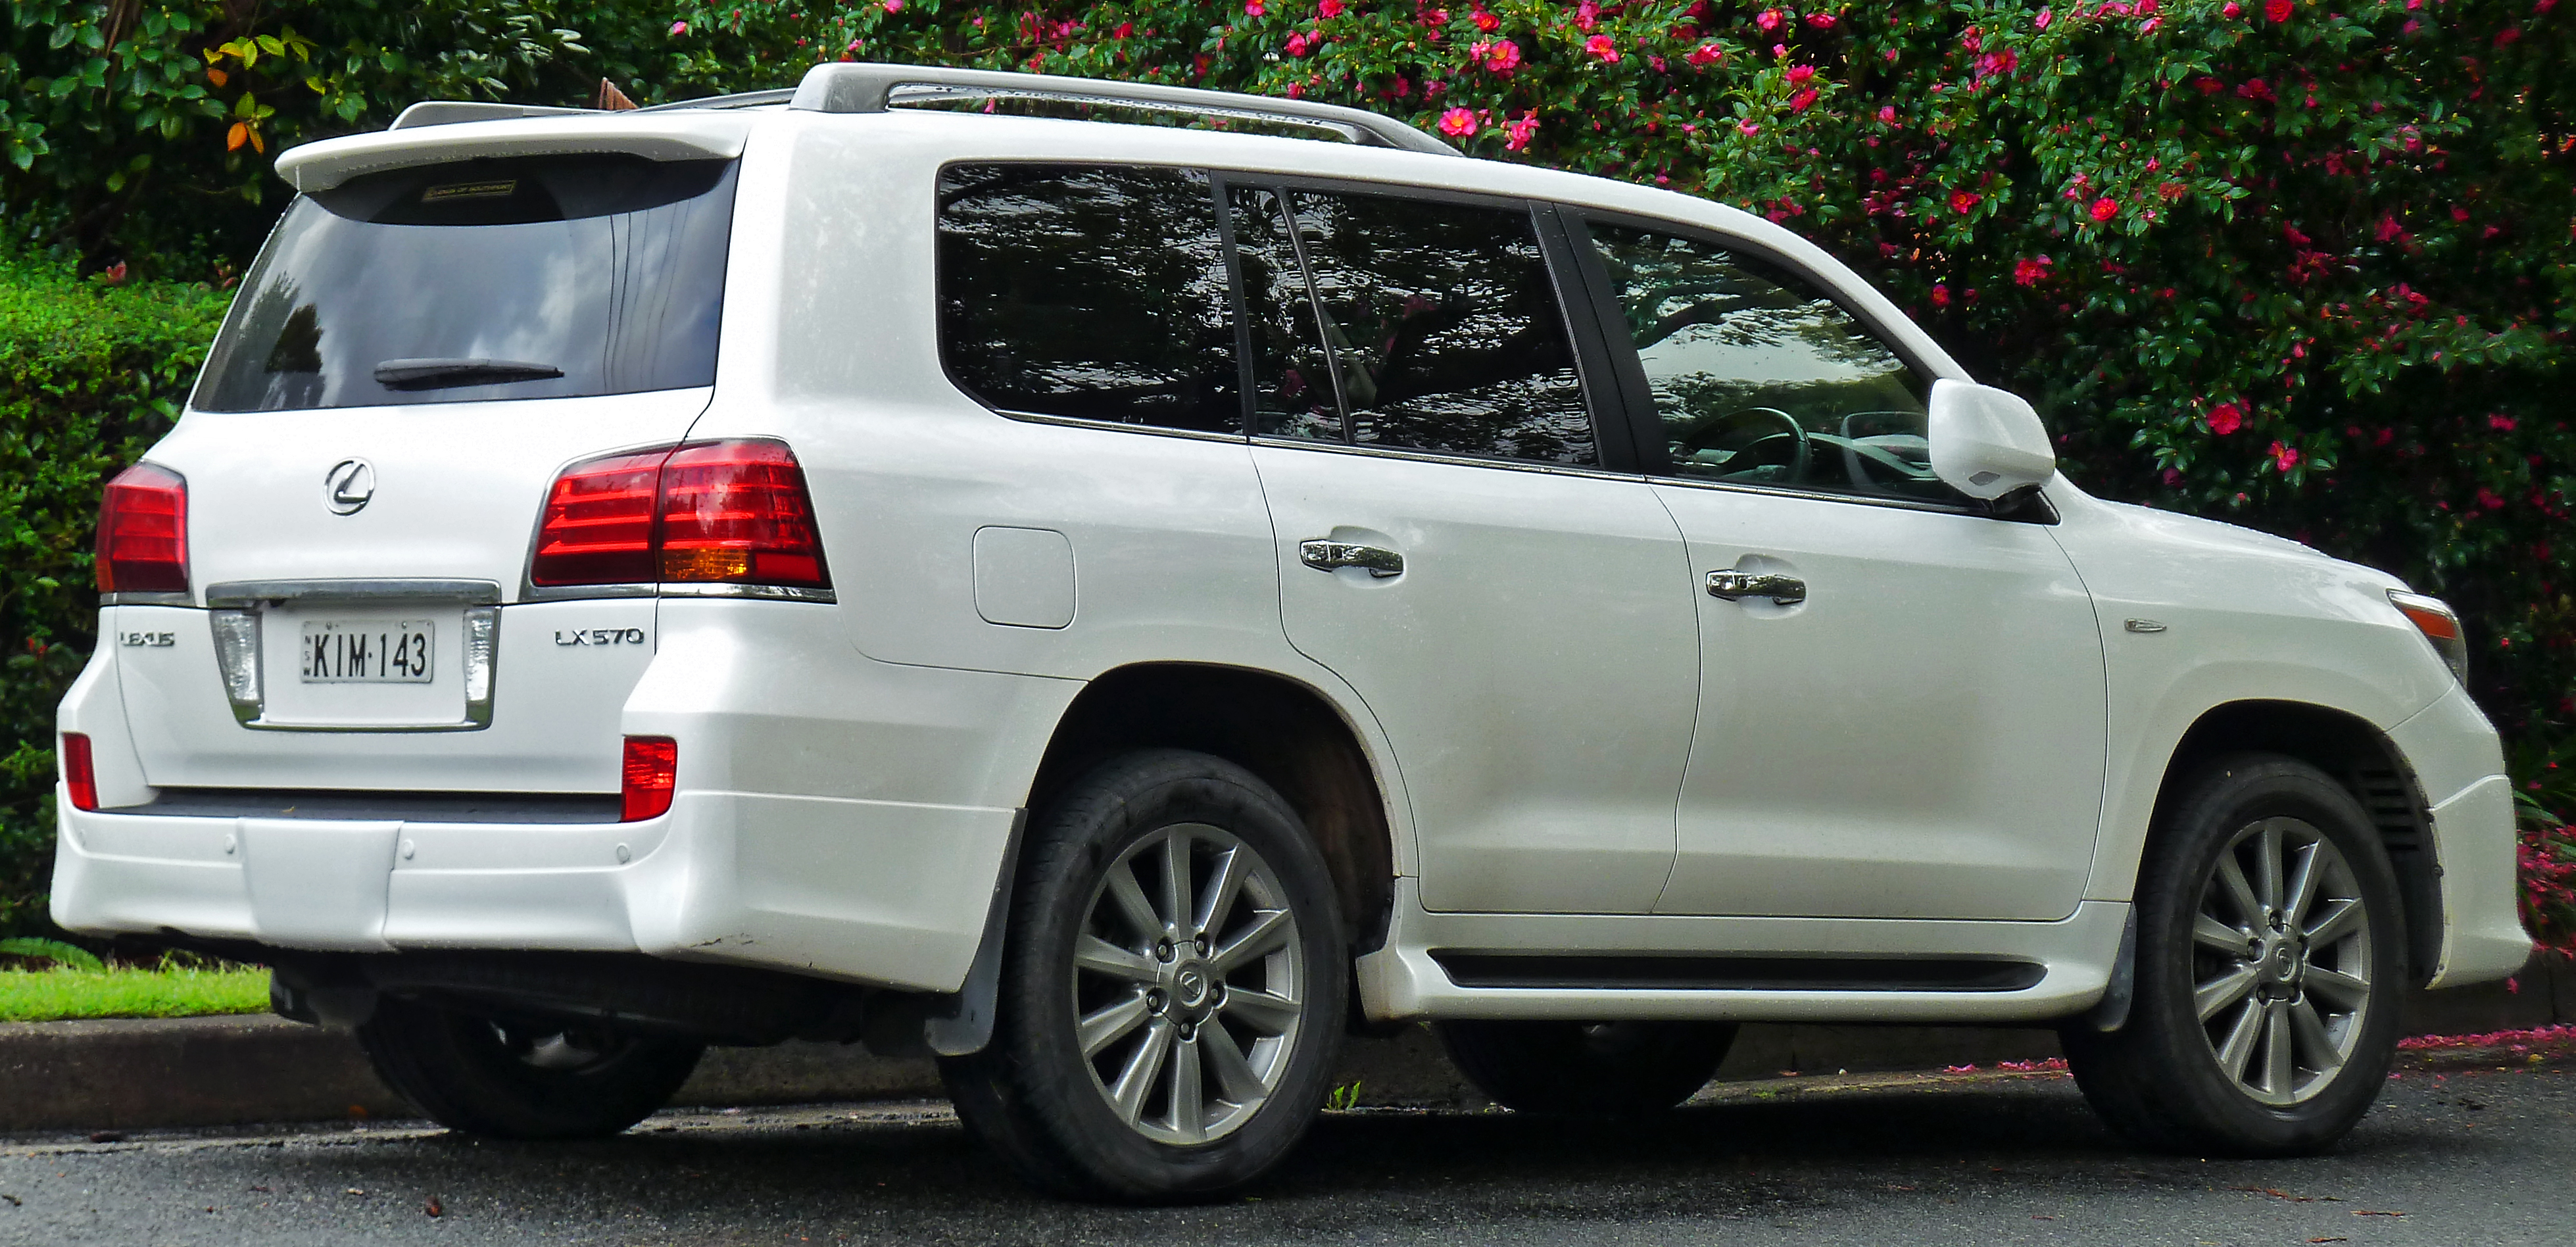 Great File:2008 2011 Lexus LX 570 (URJ201R) Sports Luxury Wagon (2011